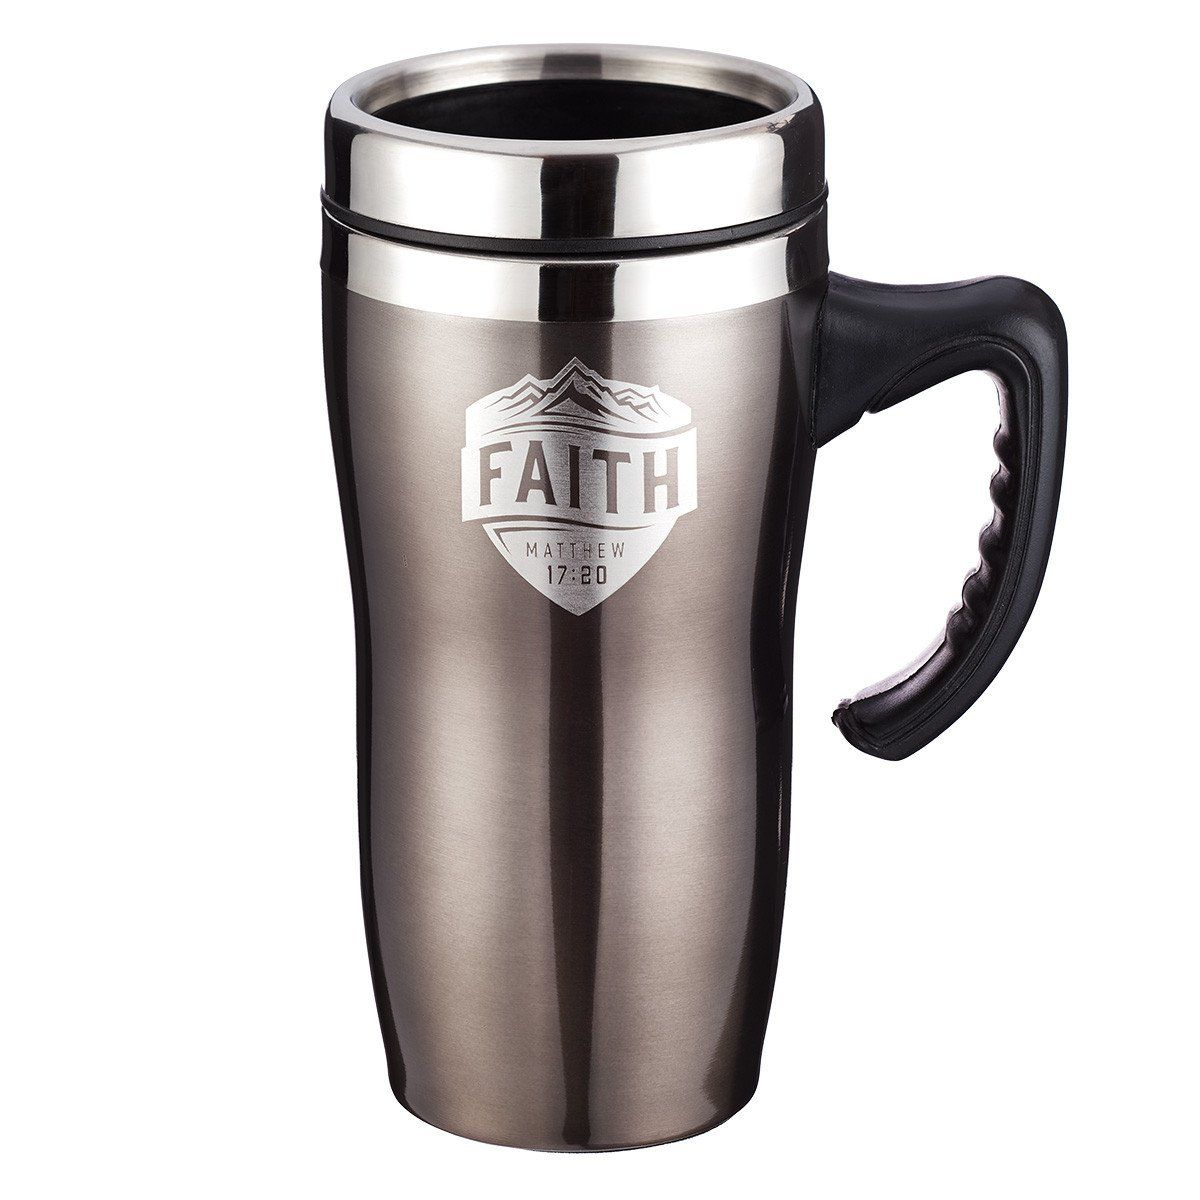 Faith Matthew 1720 Stainless Steel Travel Mug